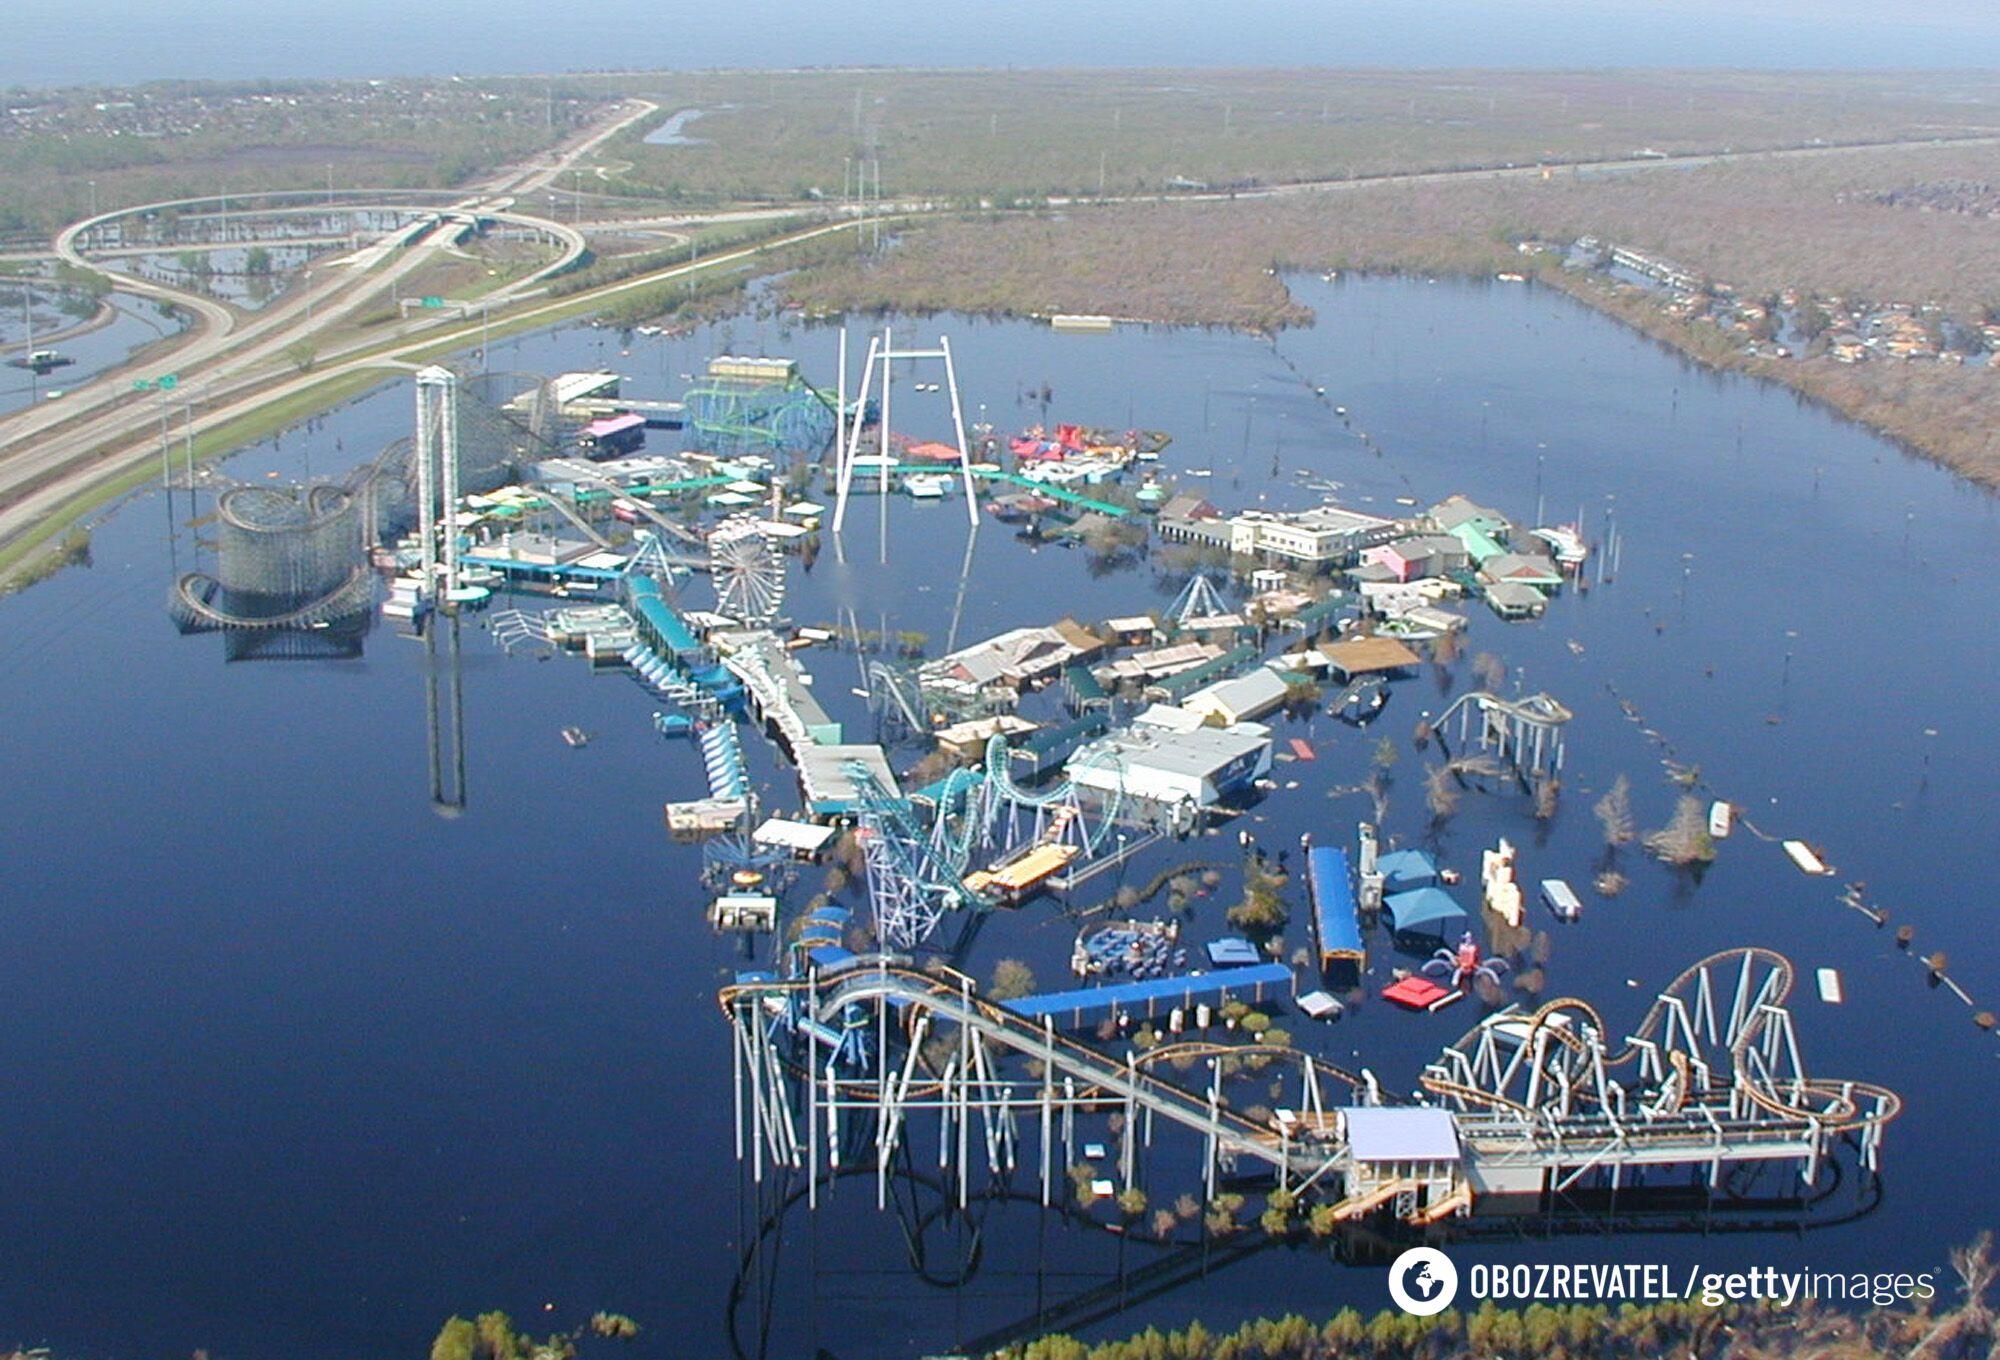 Парк Six flags затопило после урагана.